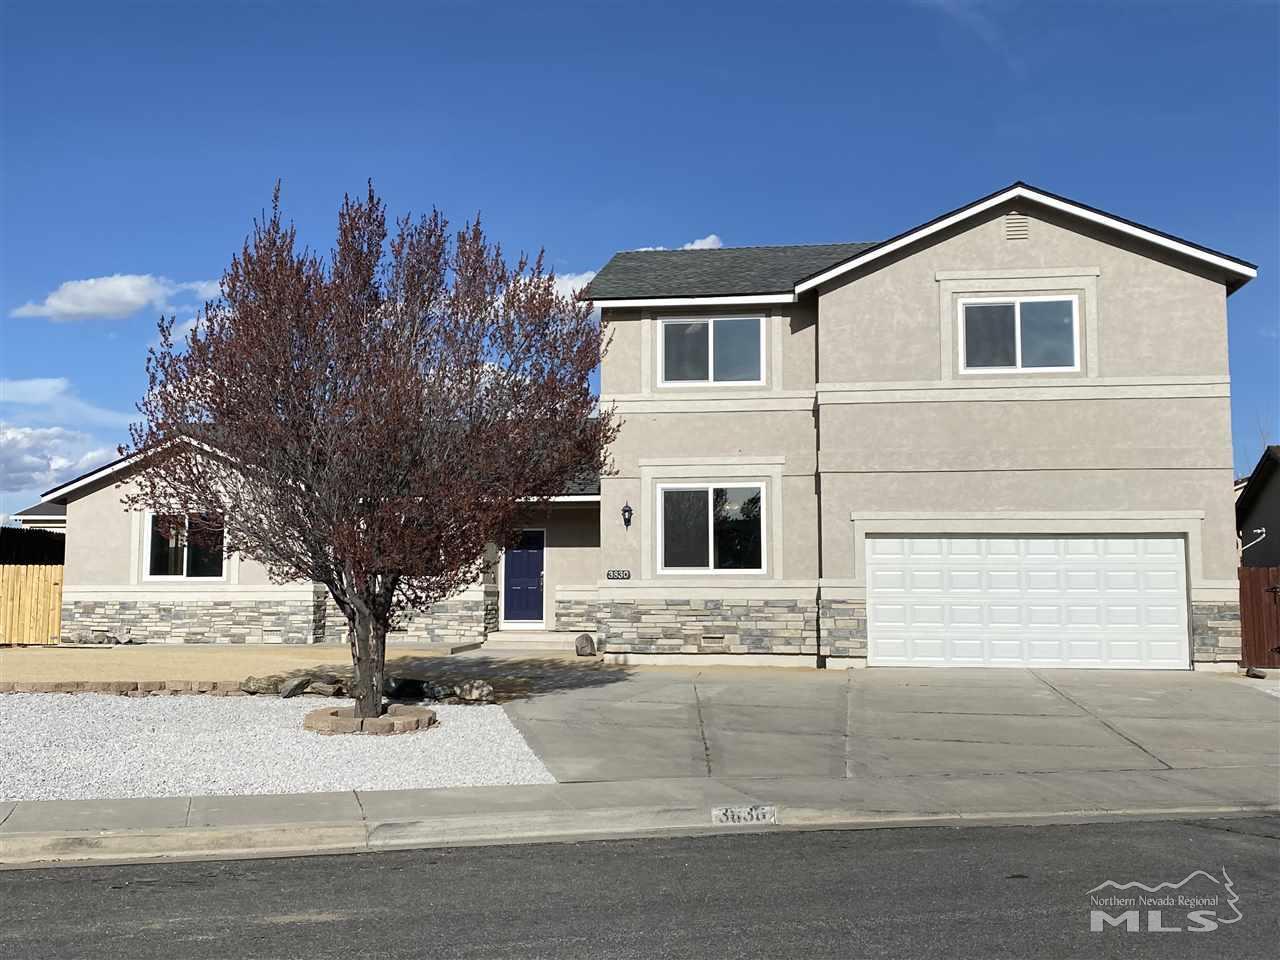 Image for 3830 Diamond Peak Dr, Reno, NV 89508